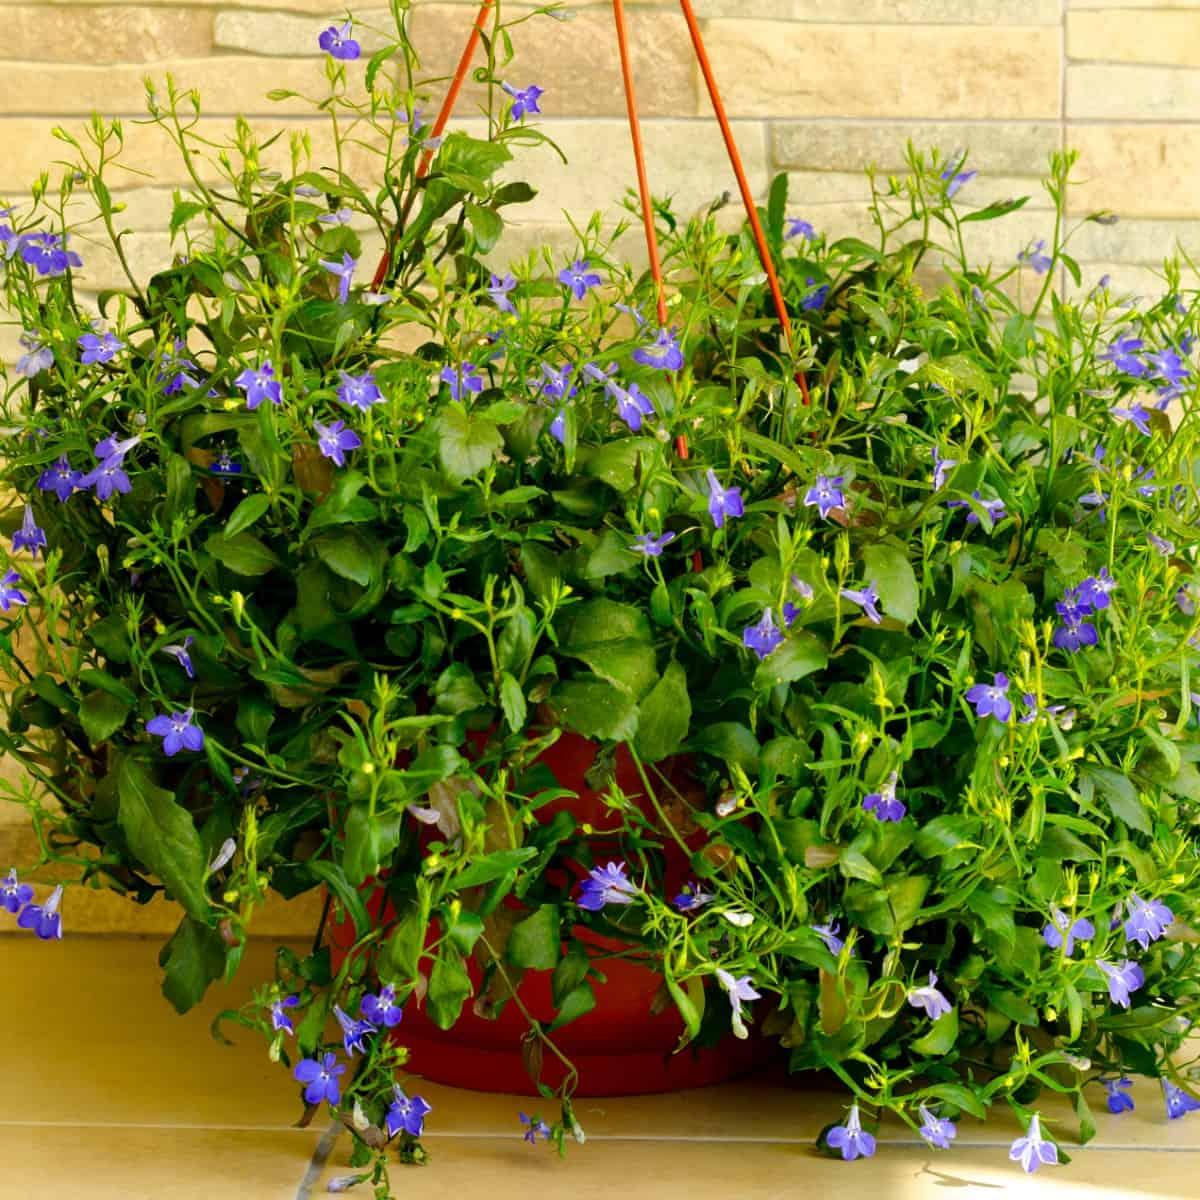 blue lobelia has attractive long-blooming blue flowers